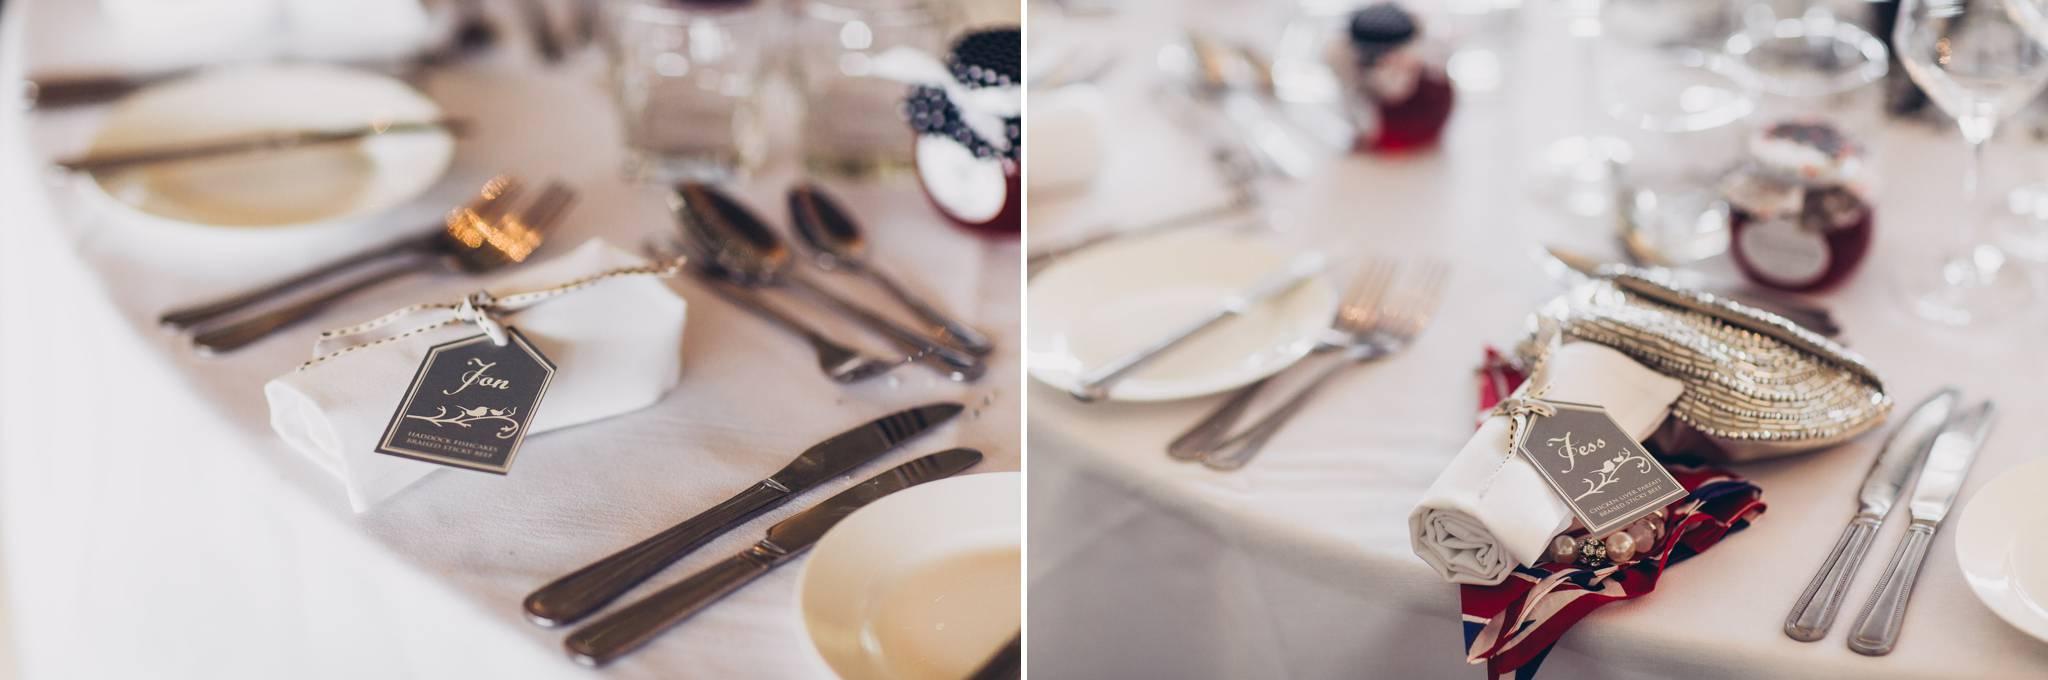 shropshire-wedding-photography 21.jpg